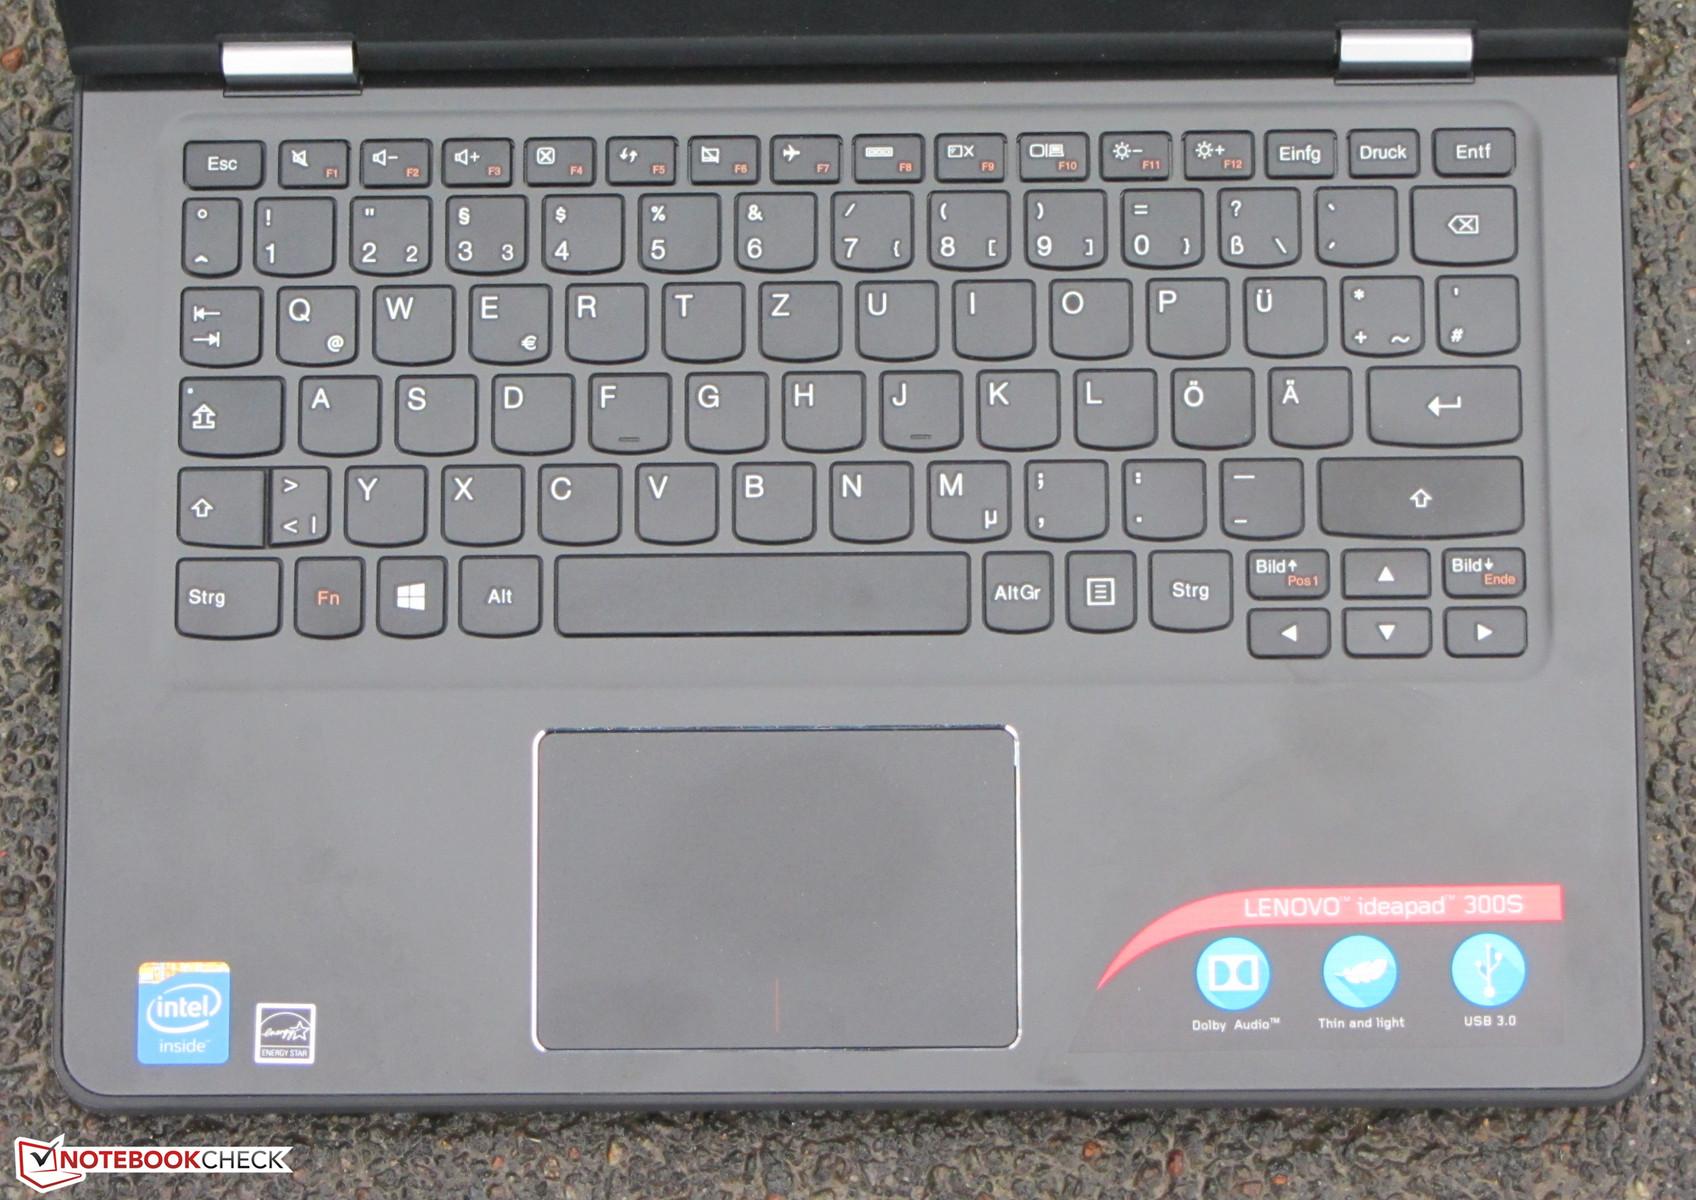 Lenovo IdeaPad 300S-11IBR Netbook Review - NotebookCheck net